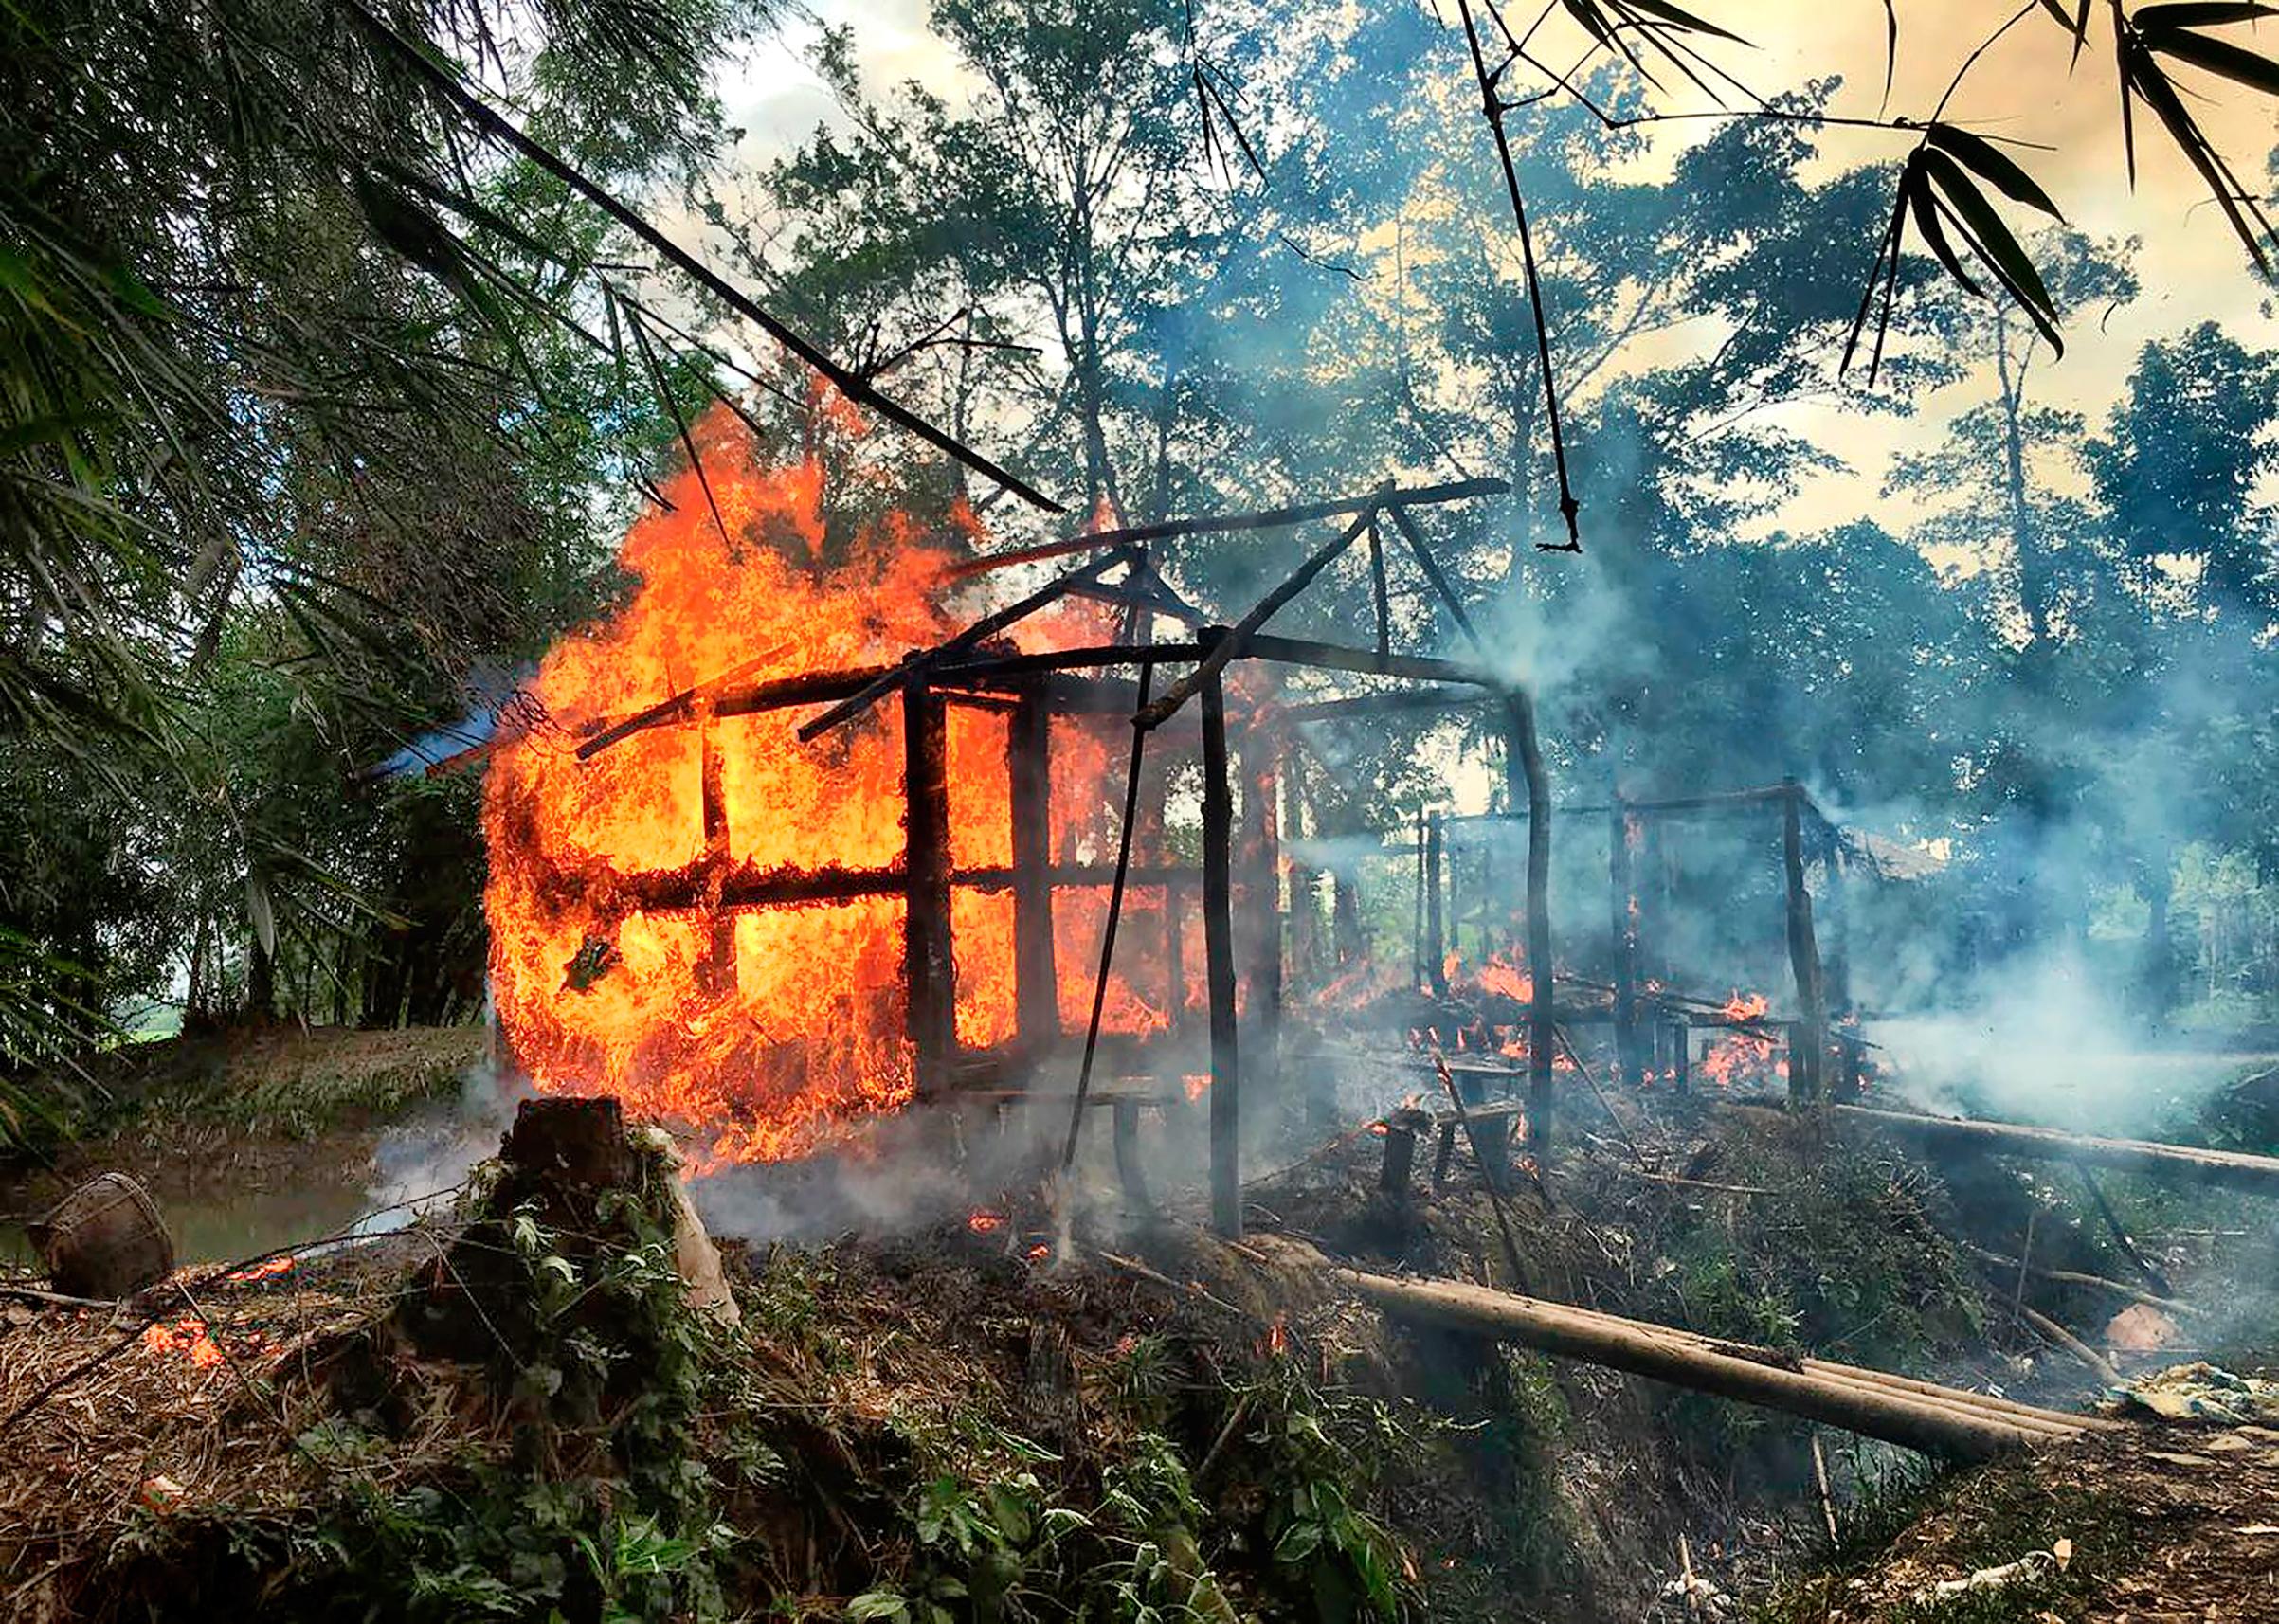 A Rohingya village burning in Rakhine state on Sept. 7.